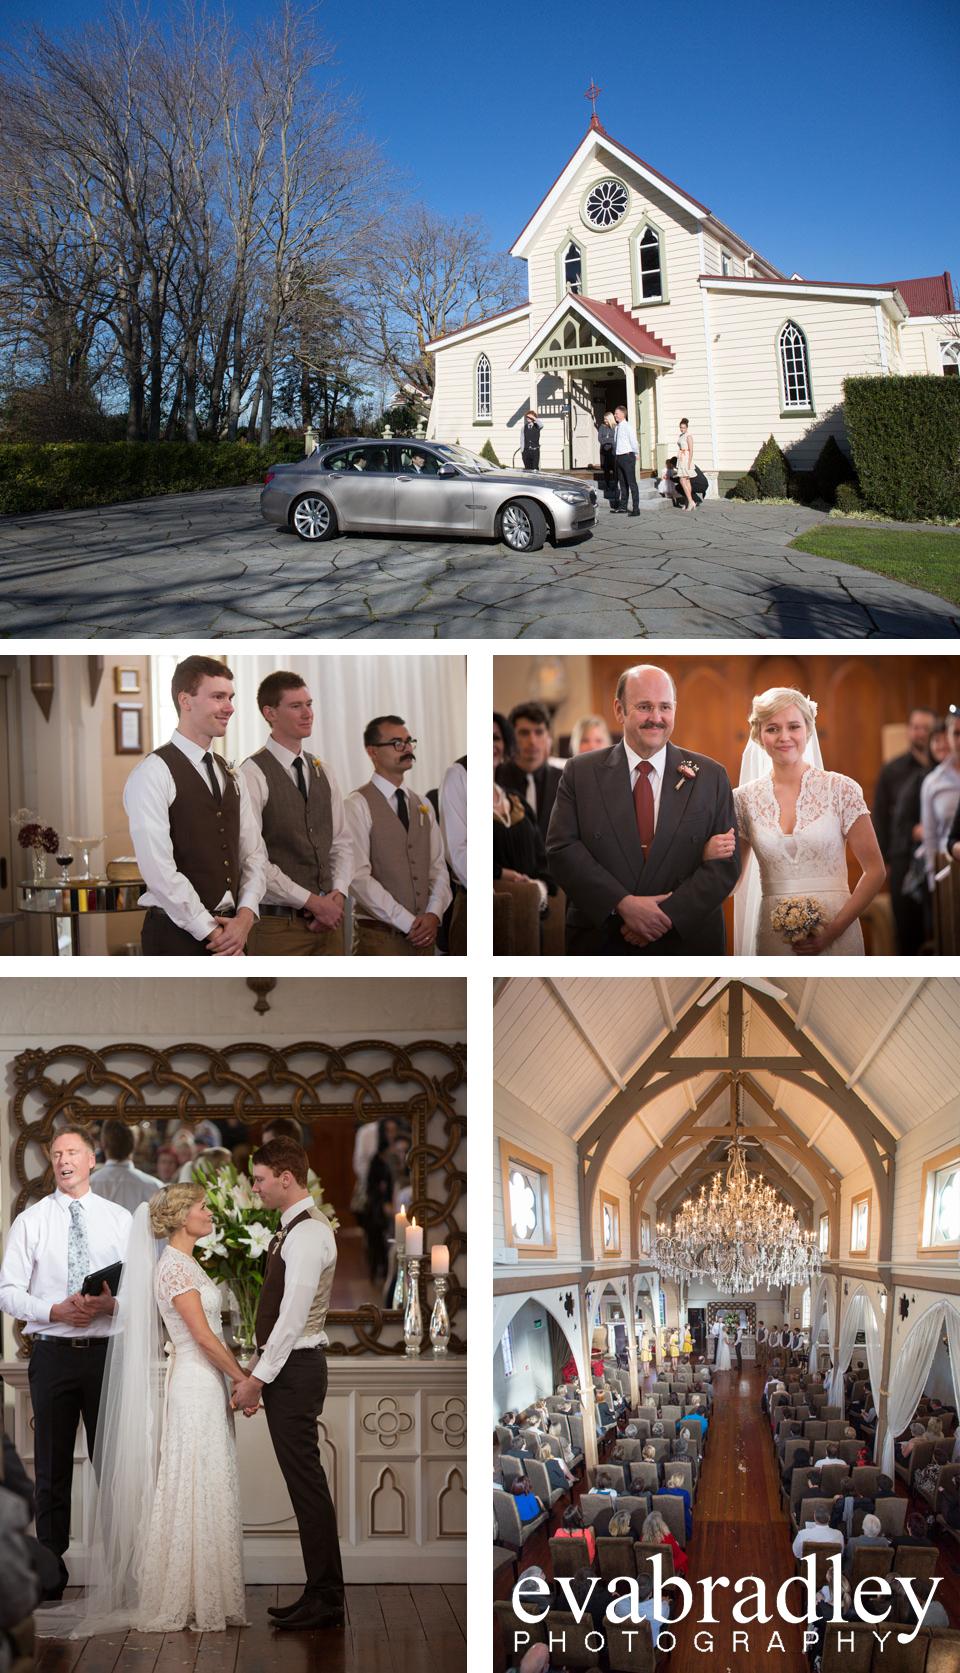 The-Old-Church-wedding-venues-Eva-Bradley (6)